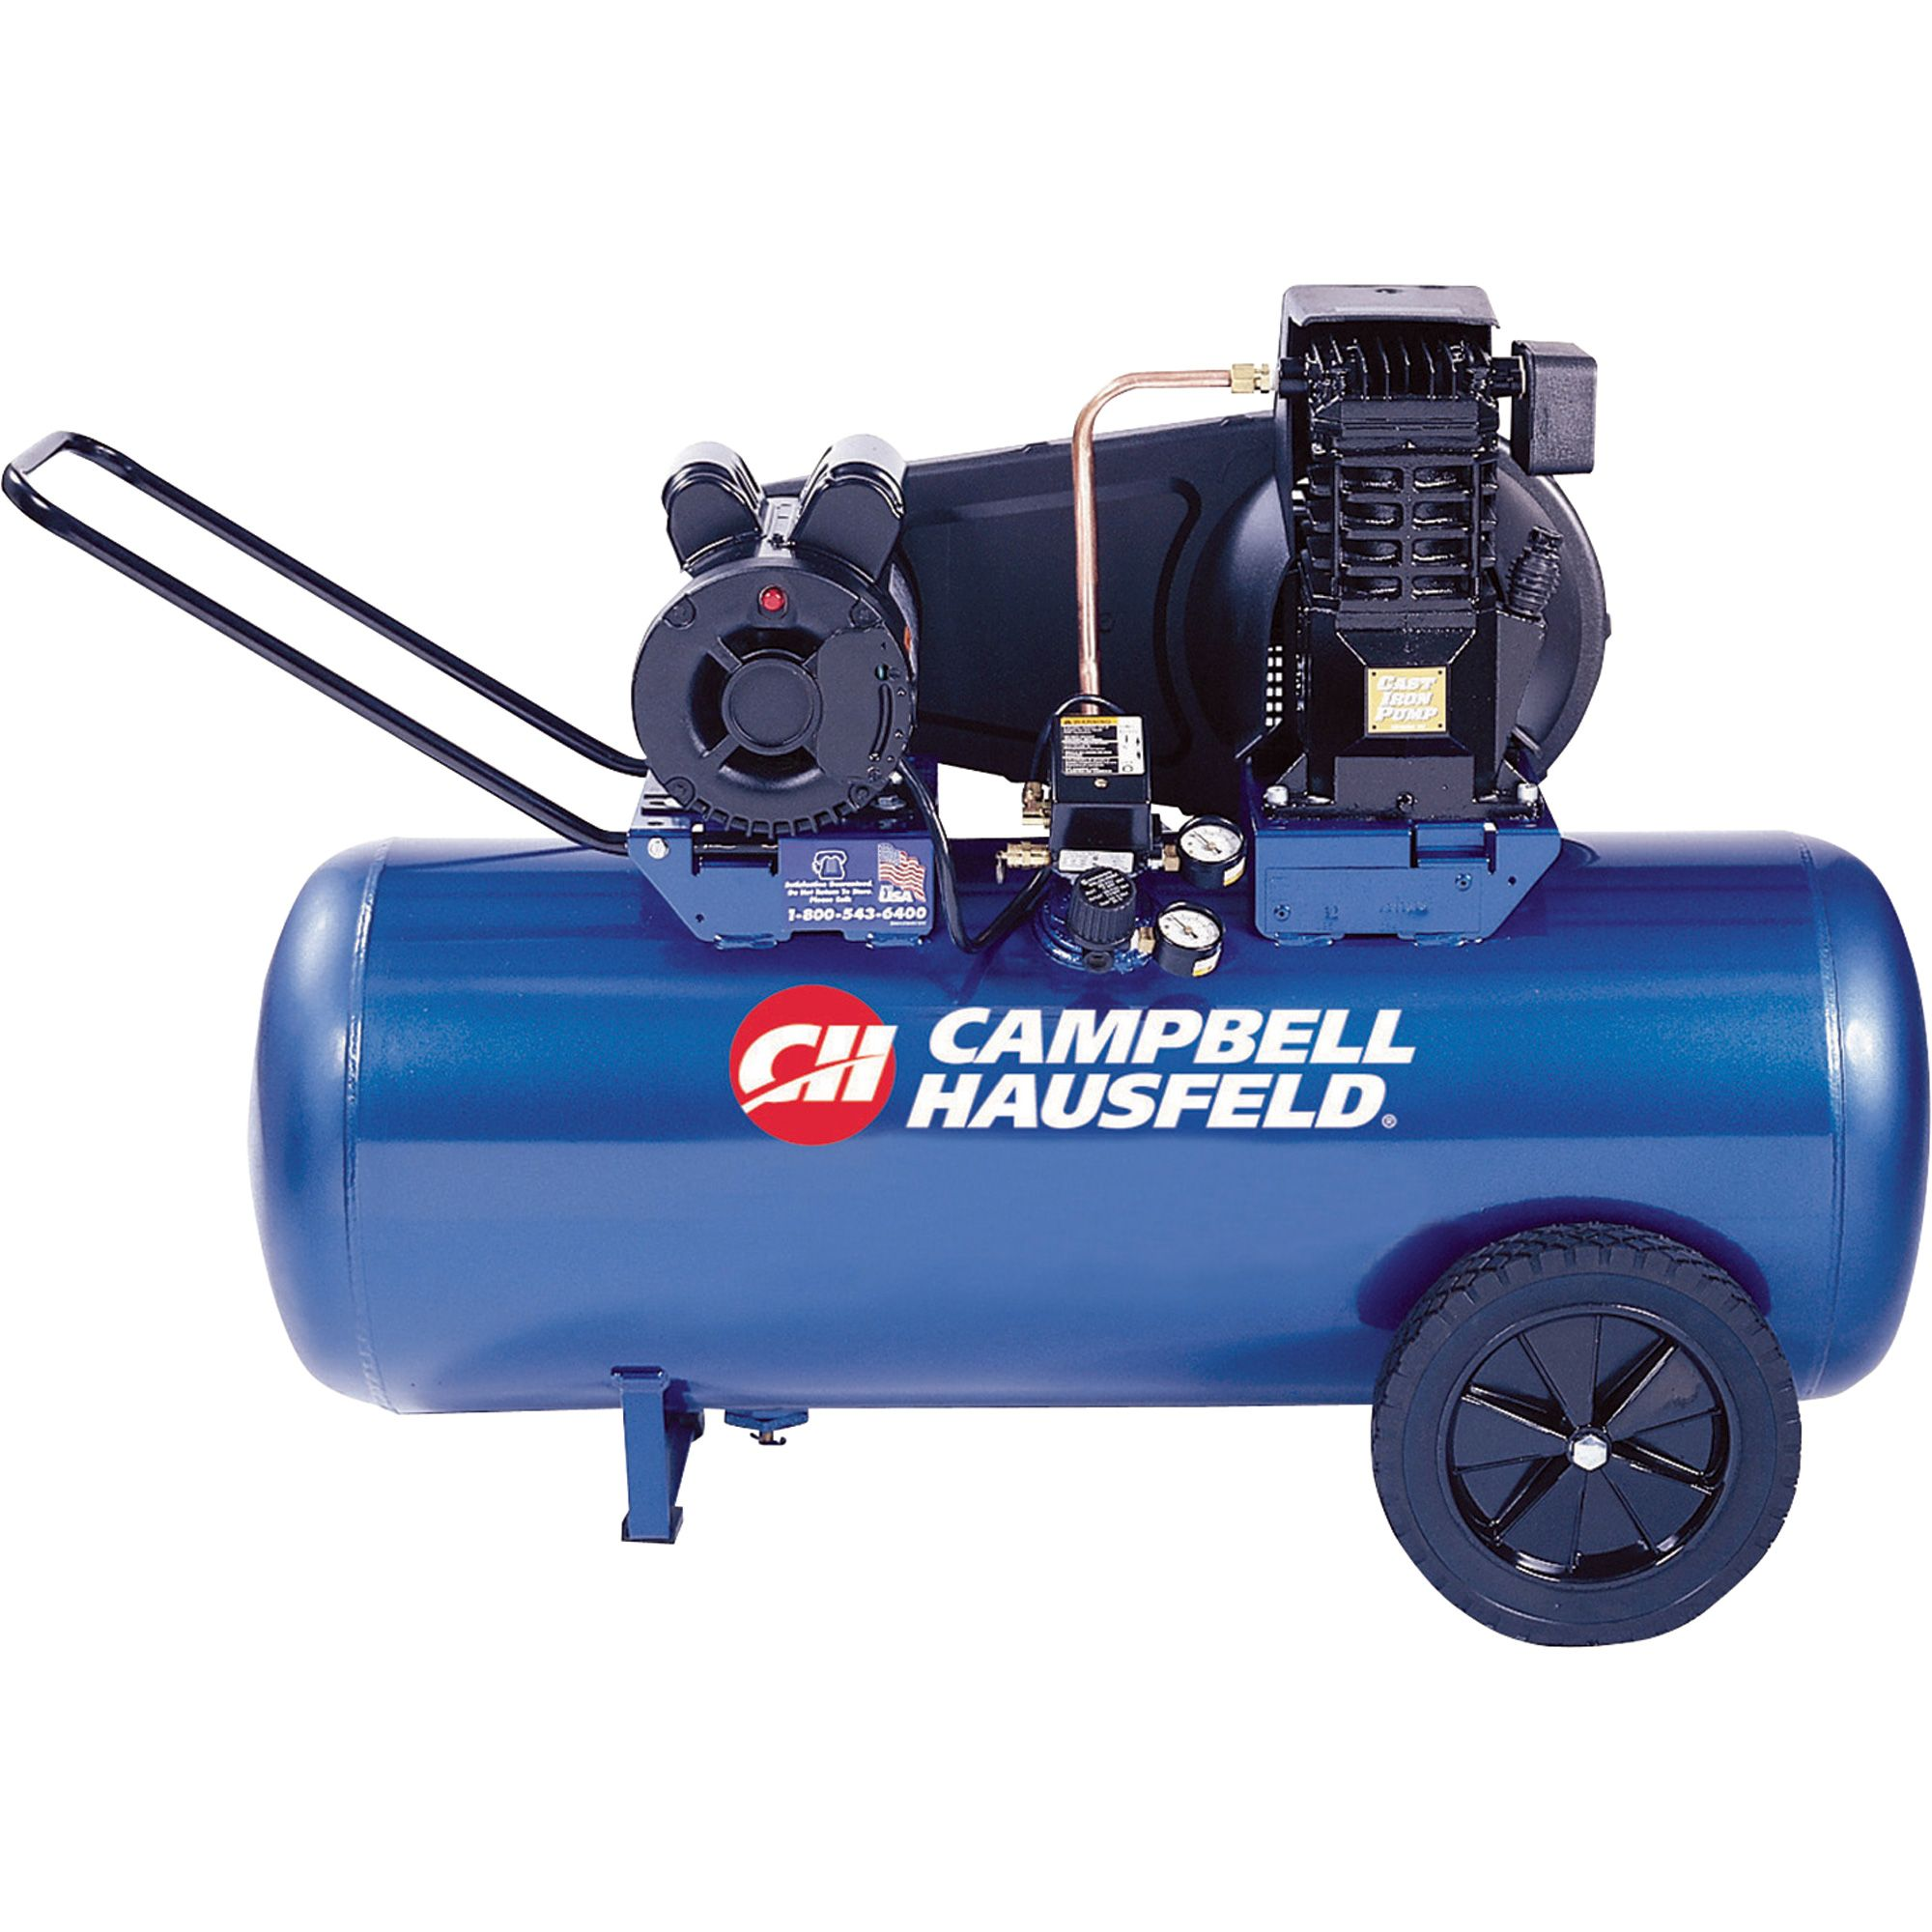 Campbell Hausfeld Portable Electric Air Compressor 3.2 HP